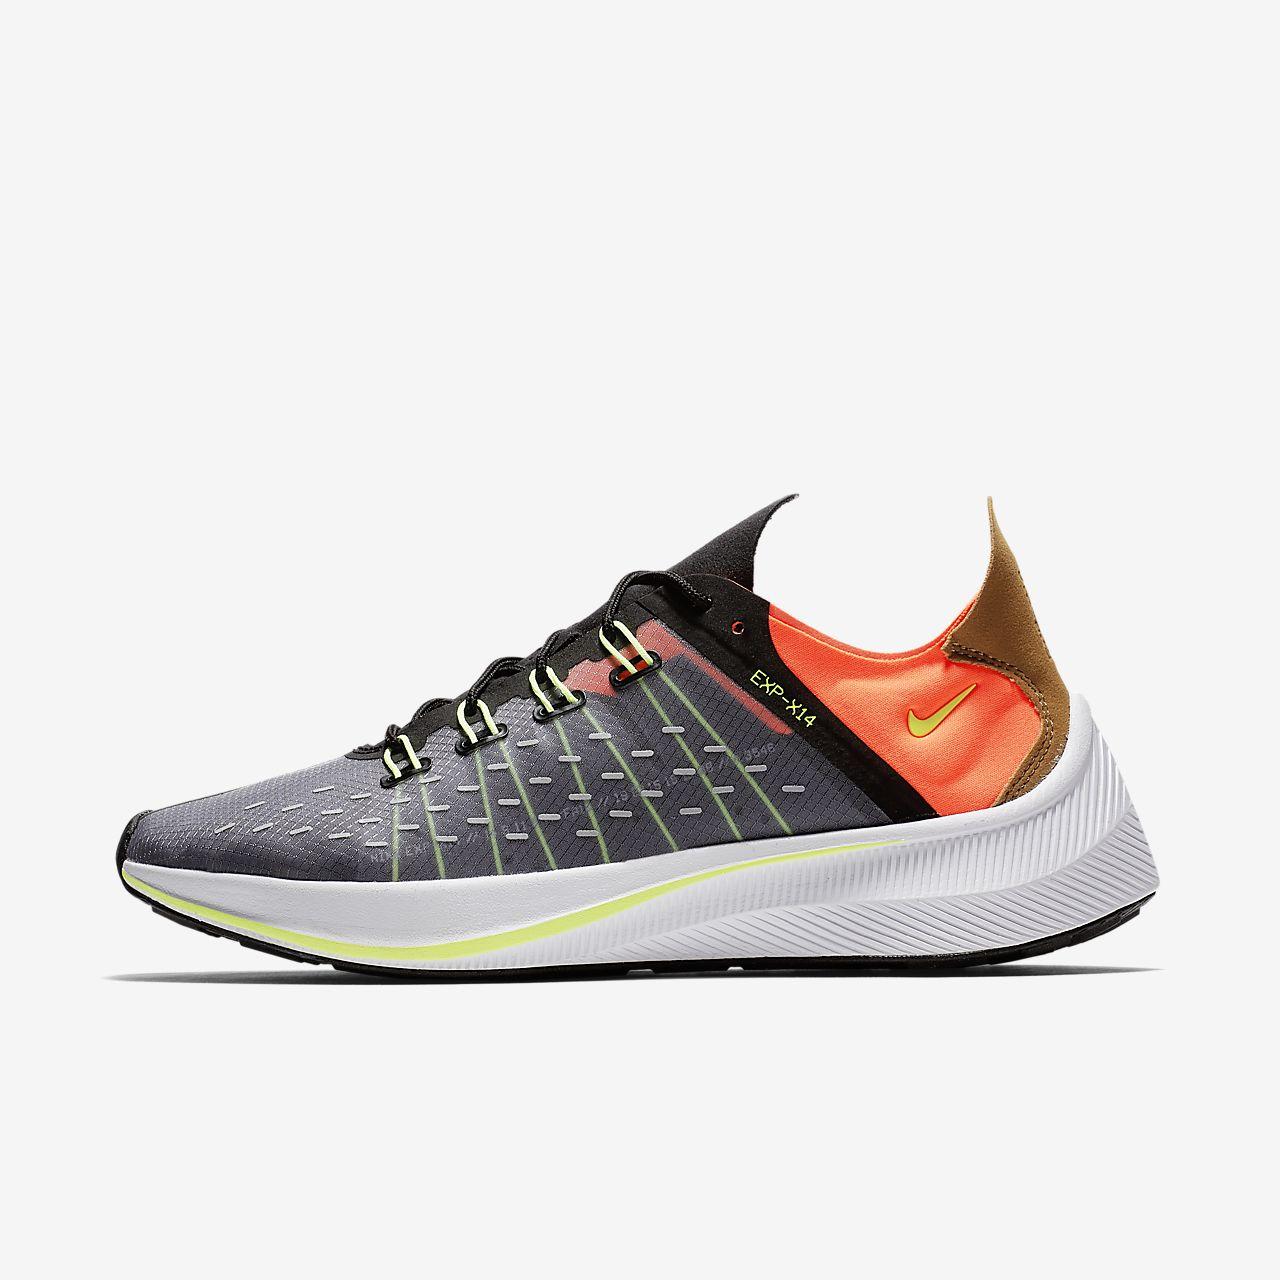 Nike Mens Running Shoe Size